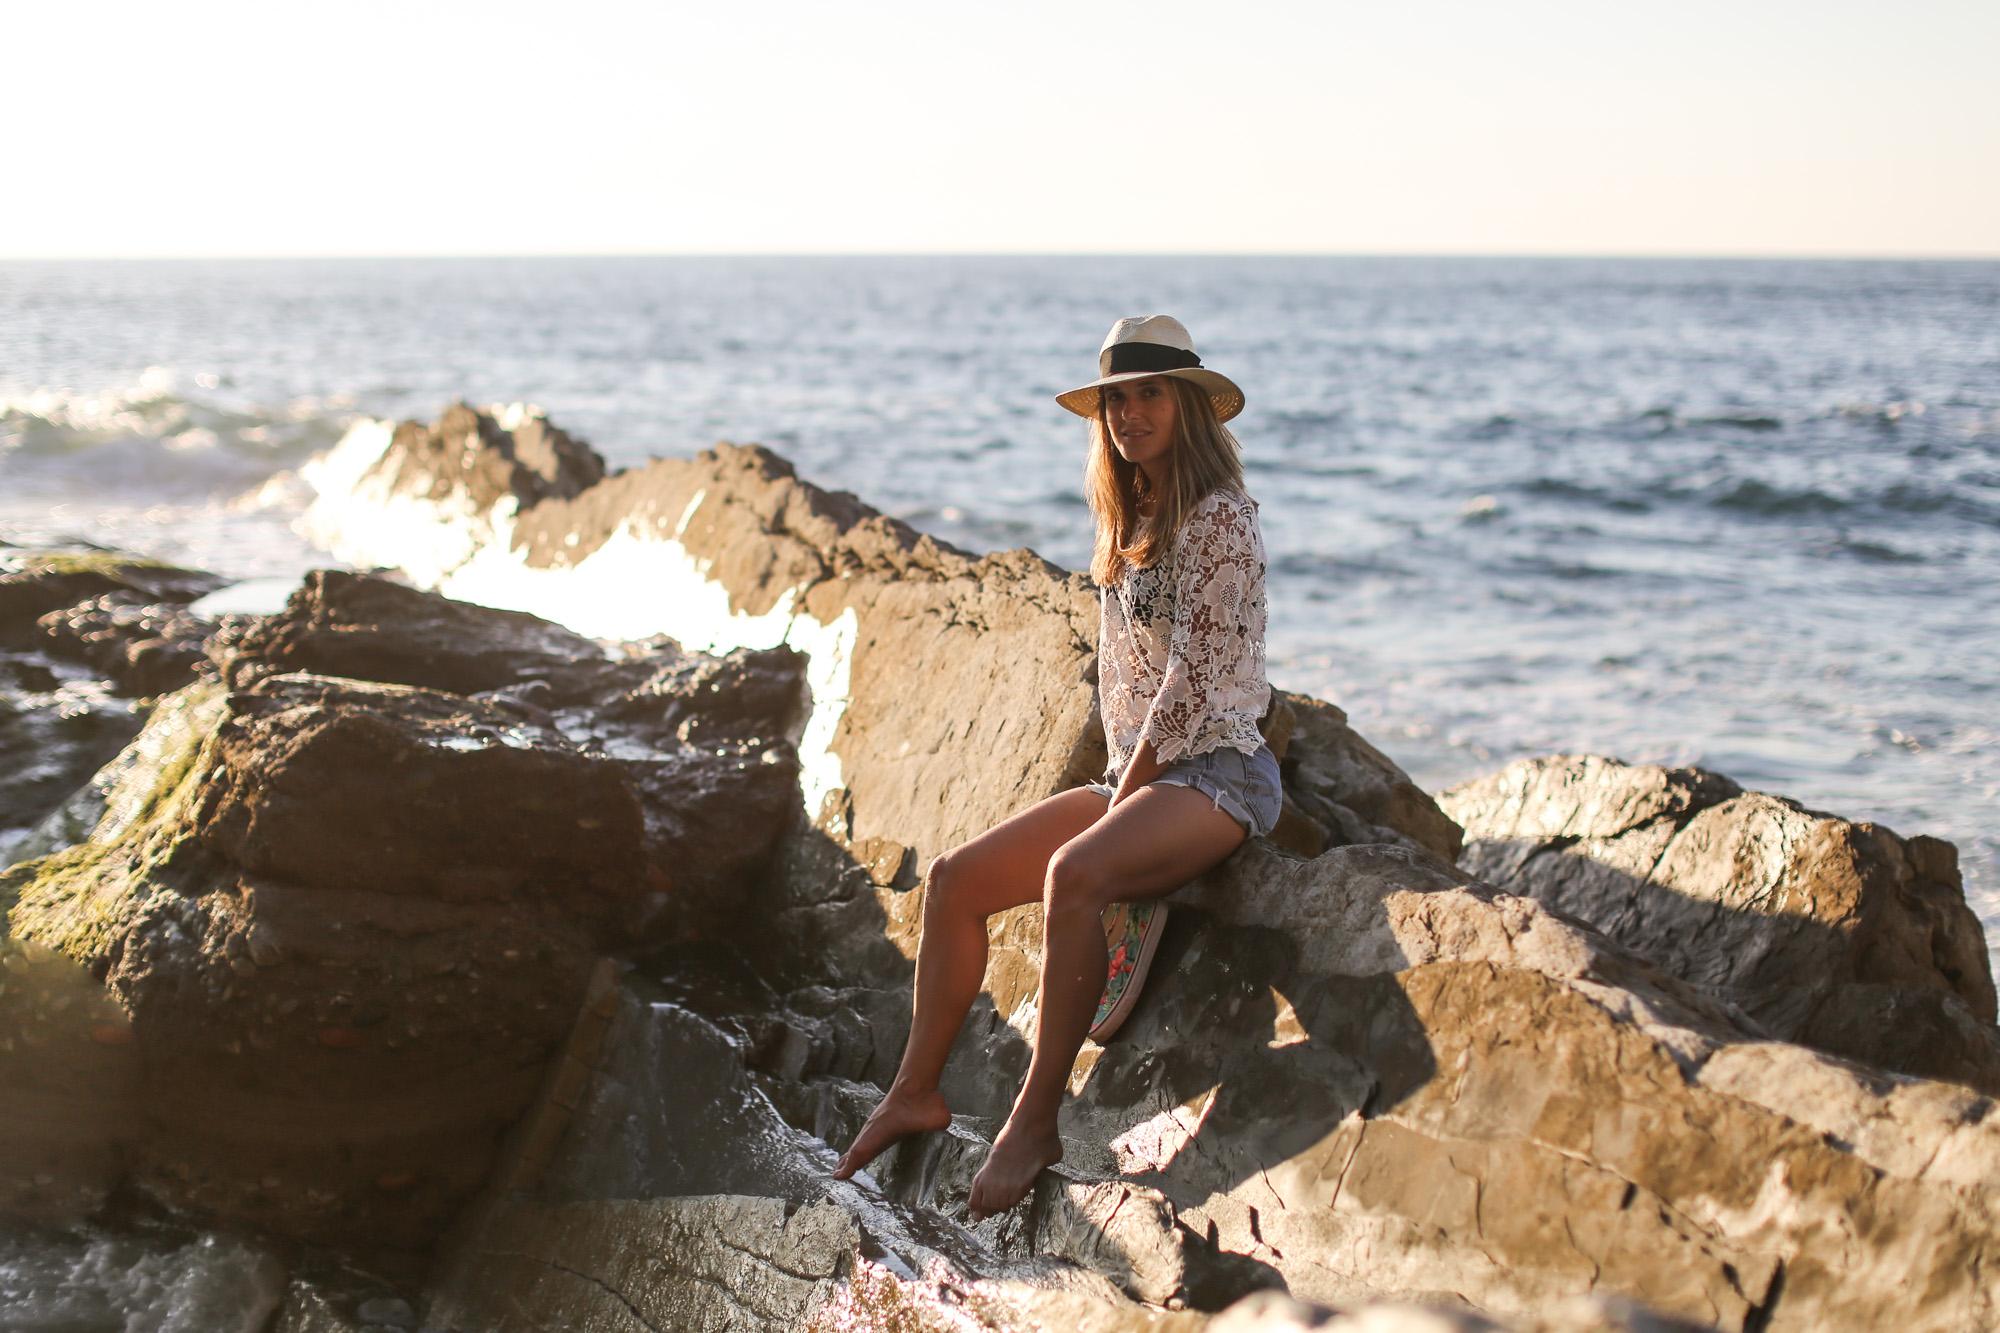 Clochet-streetstyle-vintage-levis501-crochet-top-fedora-straw-hat-3